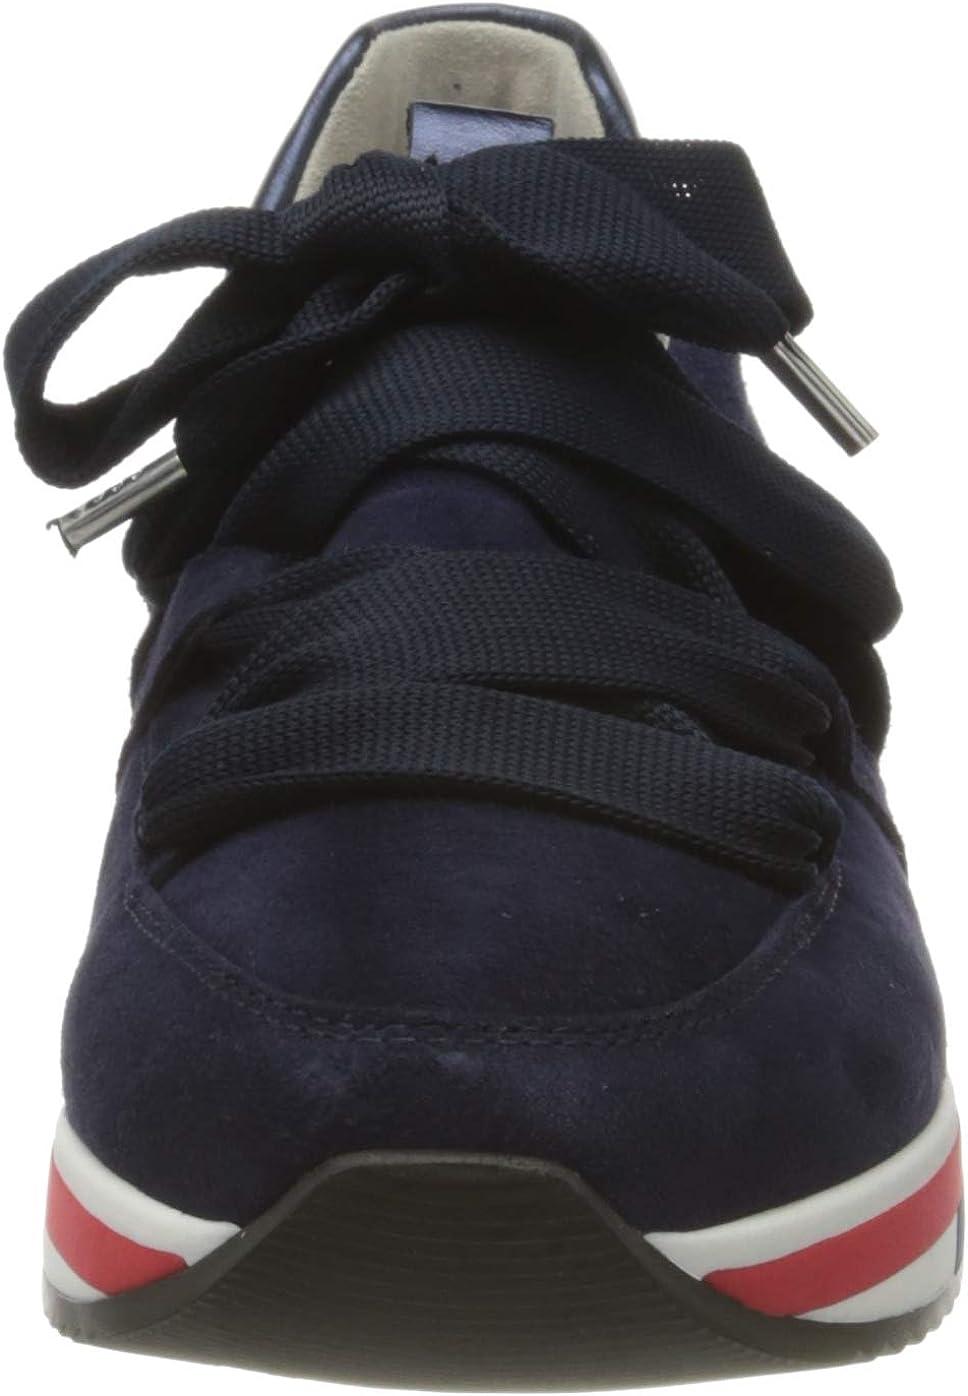 Gabor Shoes Gabor Jollys, Sneakers Basses Femme Bleu Bluette 16